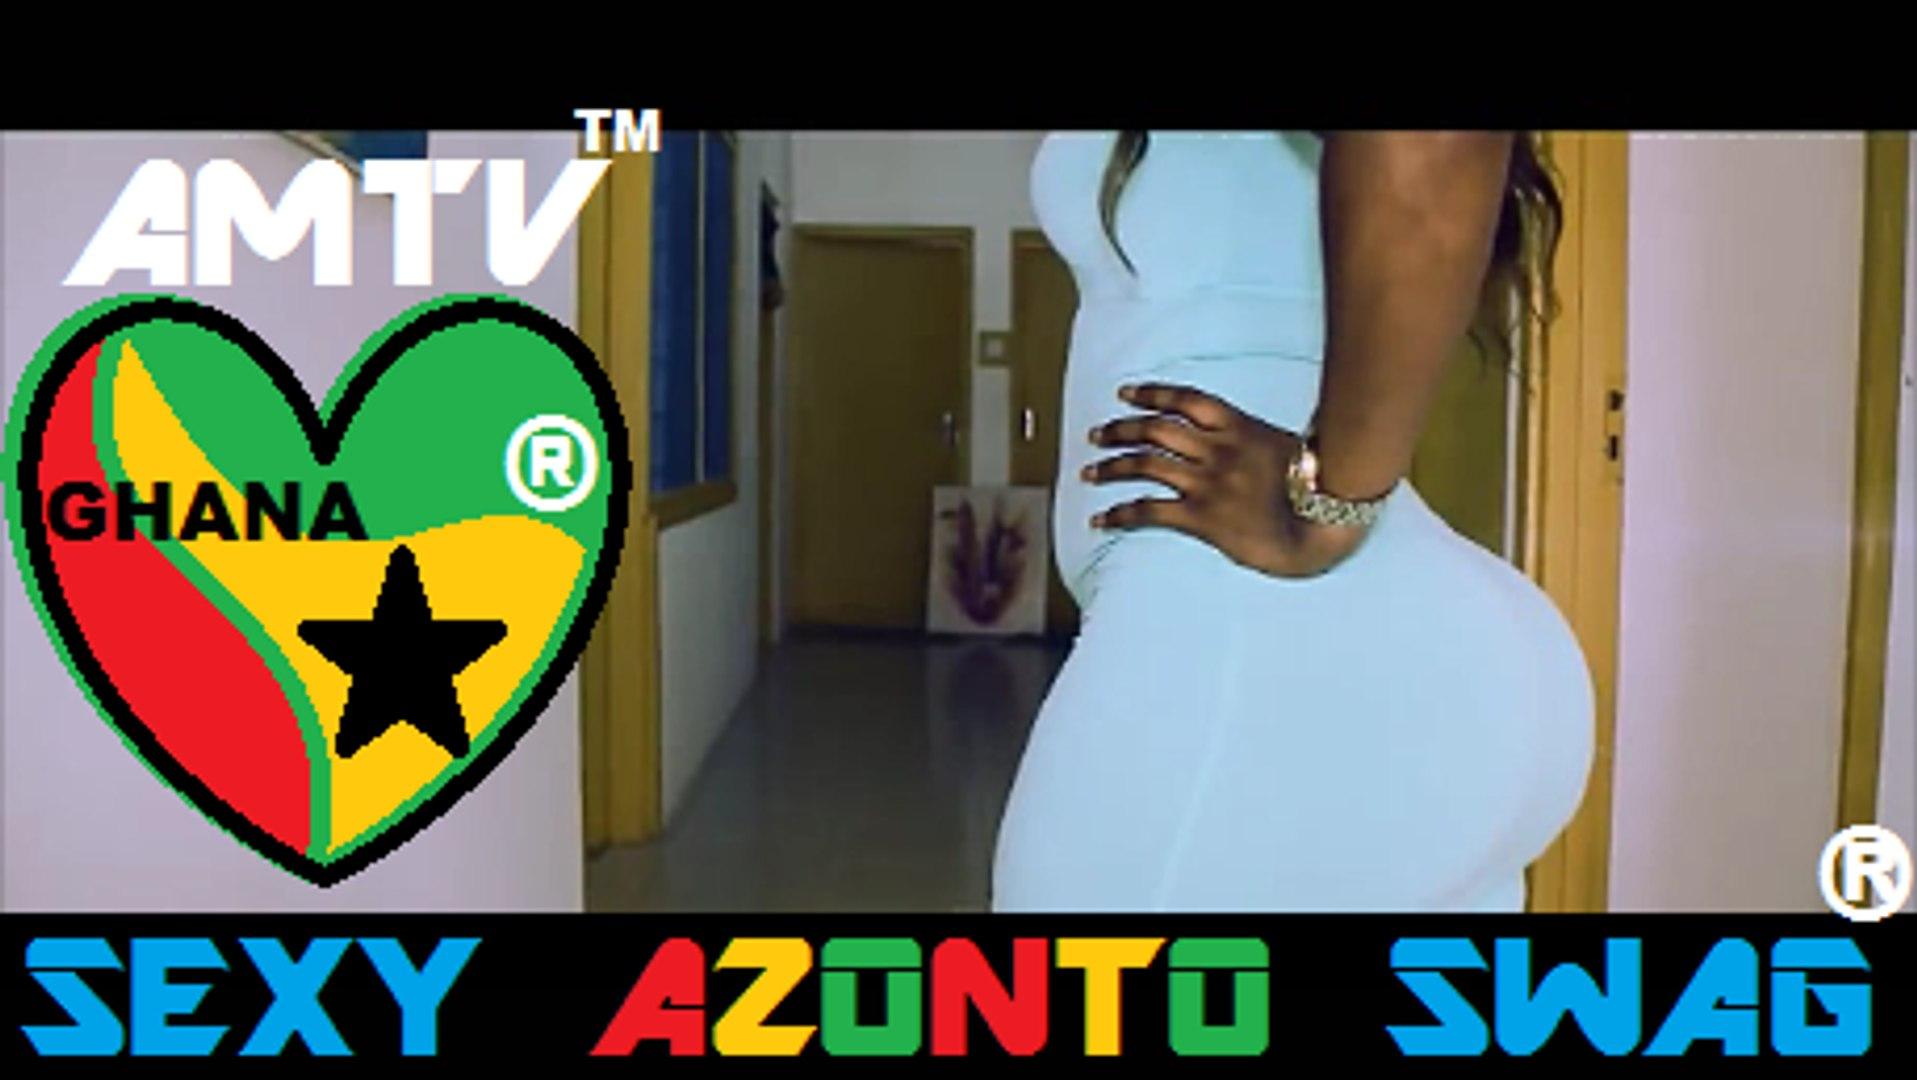 AZONTO - AFRICAN DANCE - Atumpan - Nyash (Promo Video) - MUSIC OF AFRICA - GHANA - AFRICAN MUSIC TV.